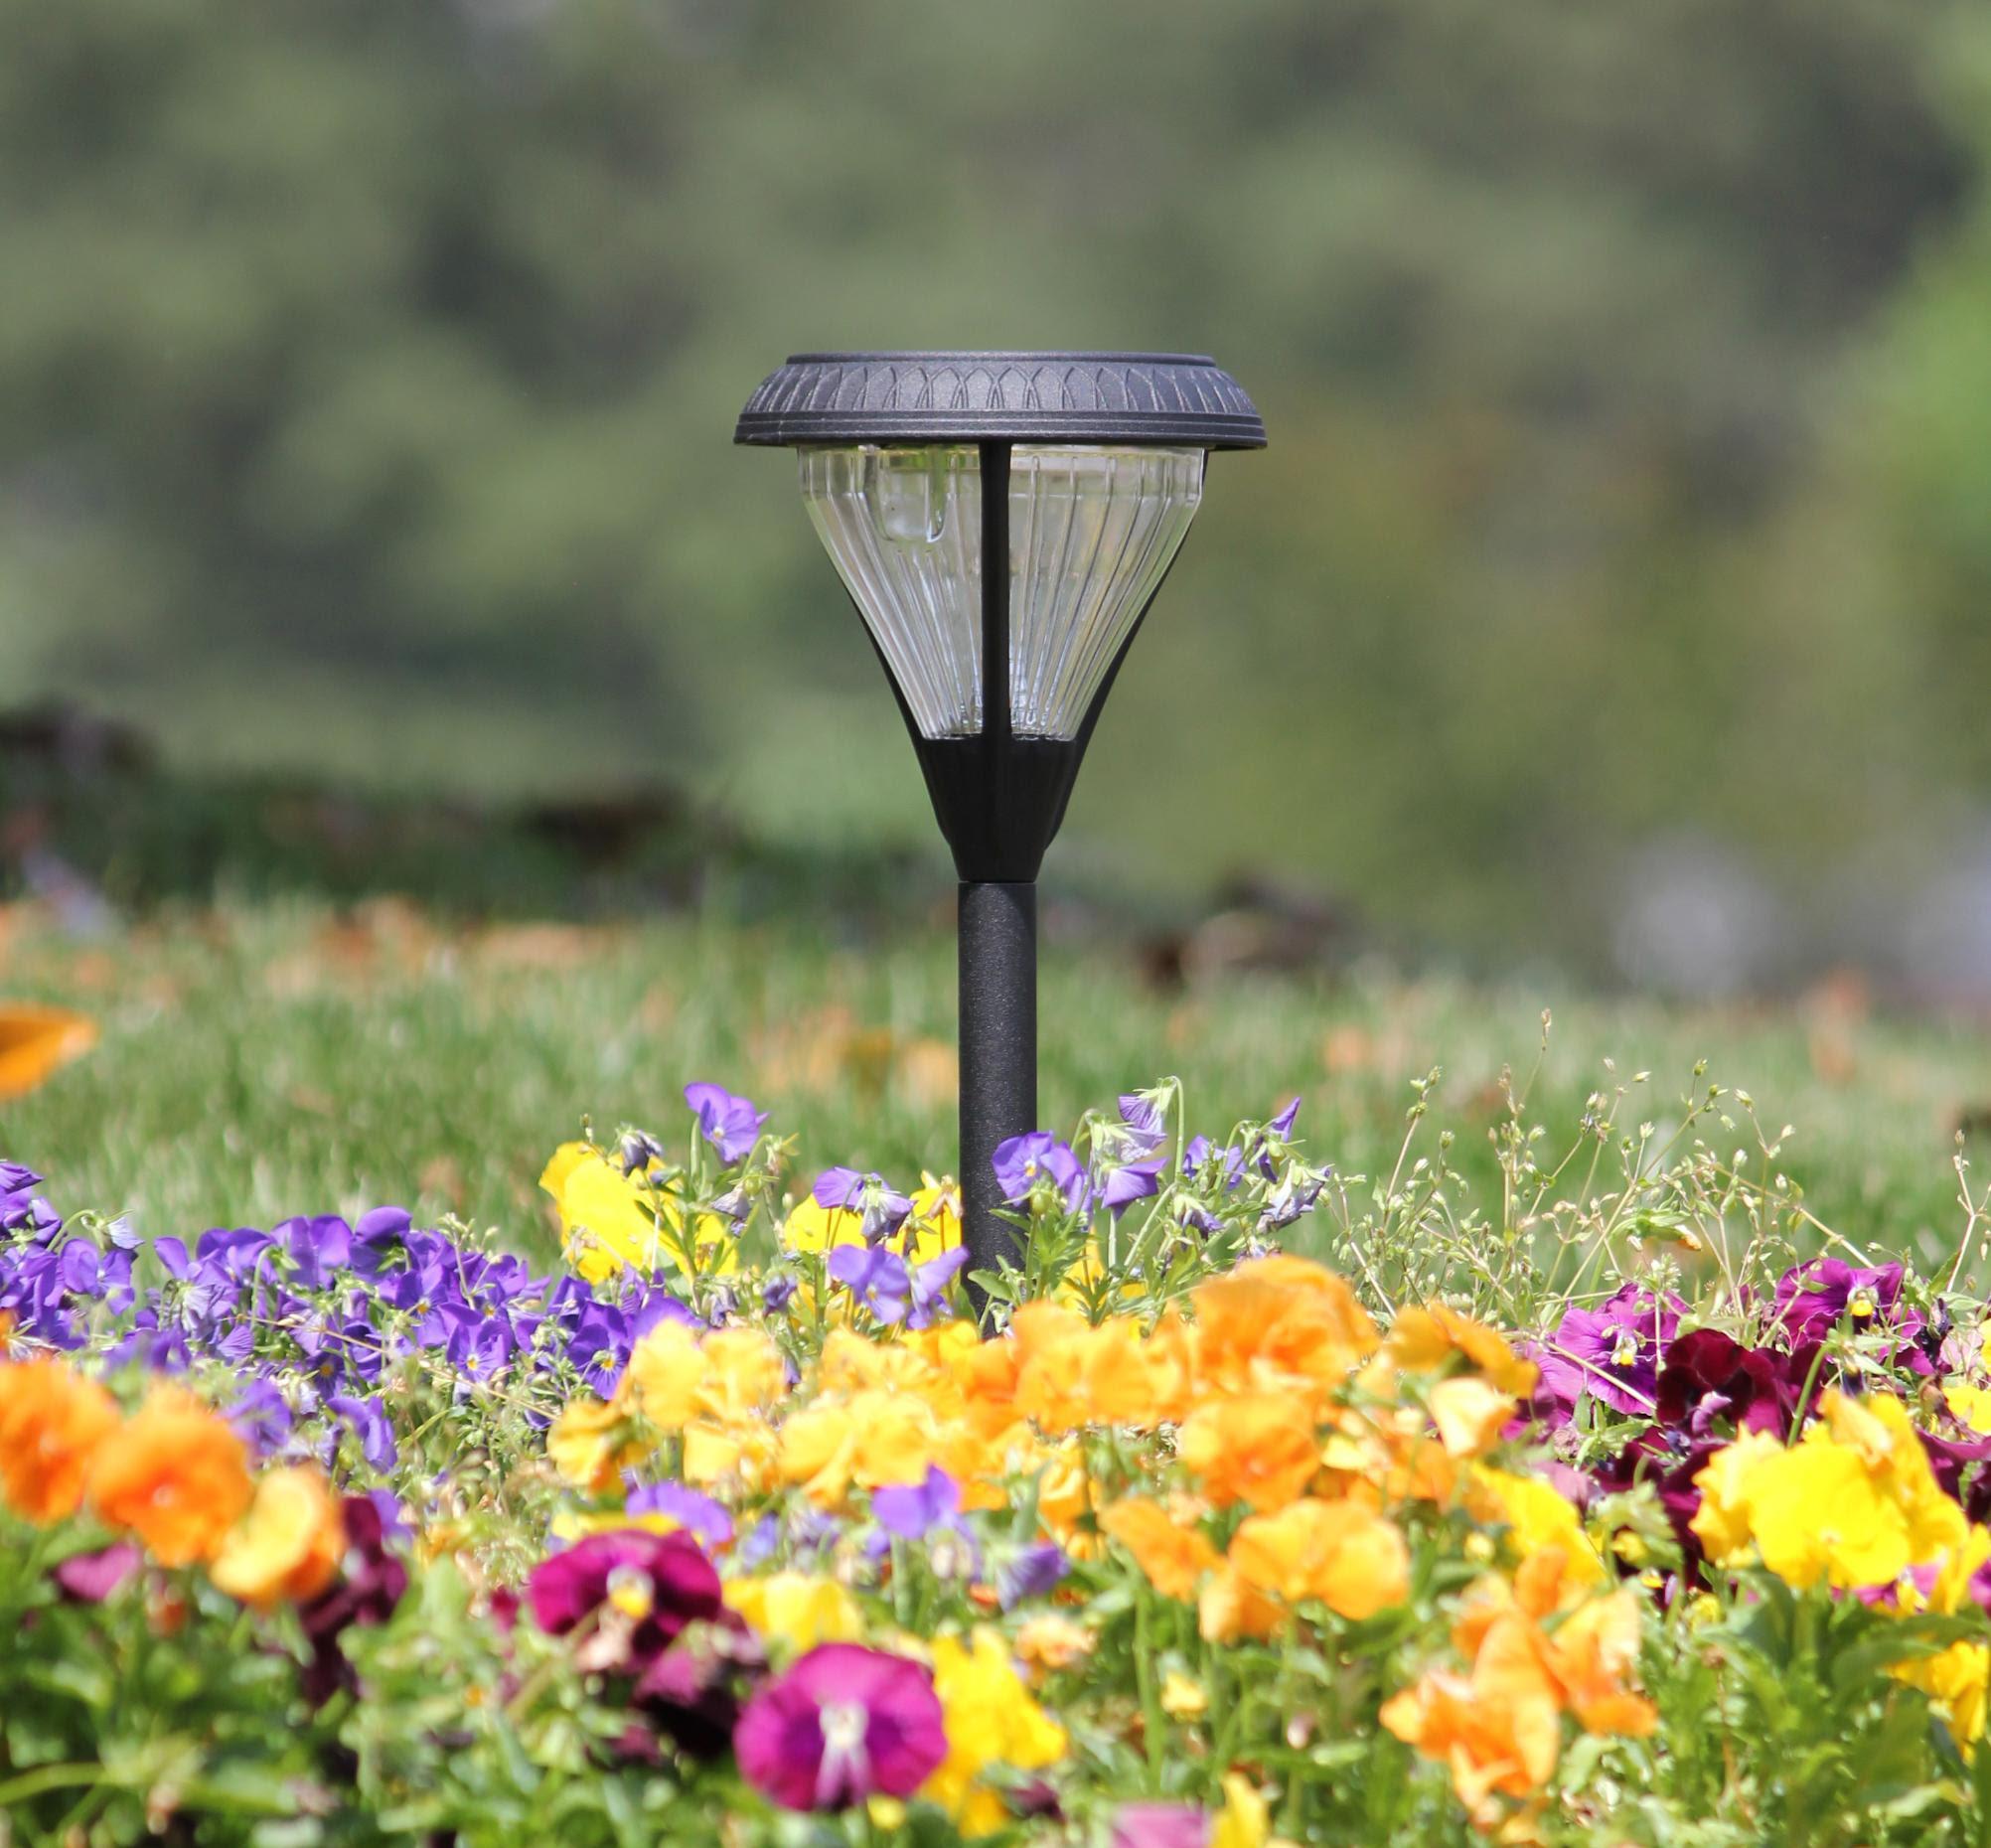 Amazon.com : Gama Sonic Premier Solar Landscape Path and Garden Light, Black Finish, Set of 2